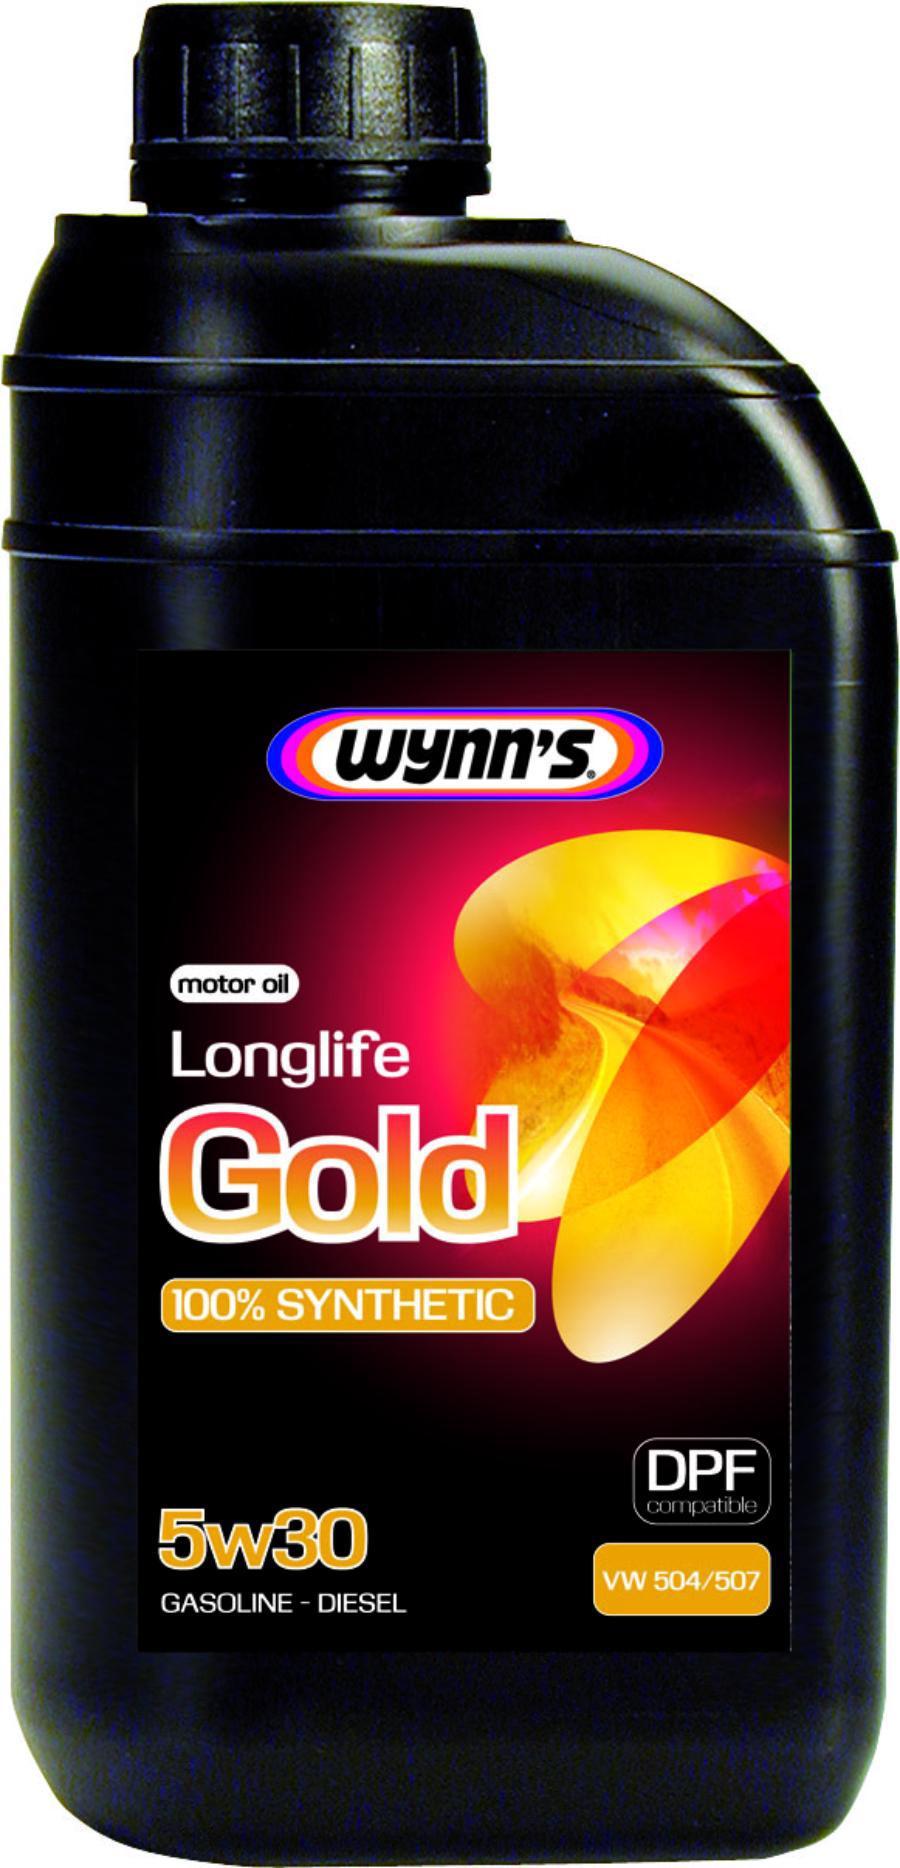 Моторное масло синтетическое WYNNS LONGLIFE GOLD 5W-30, 1л